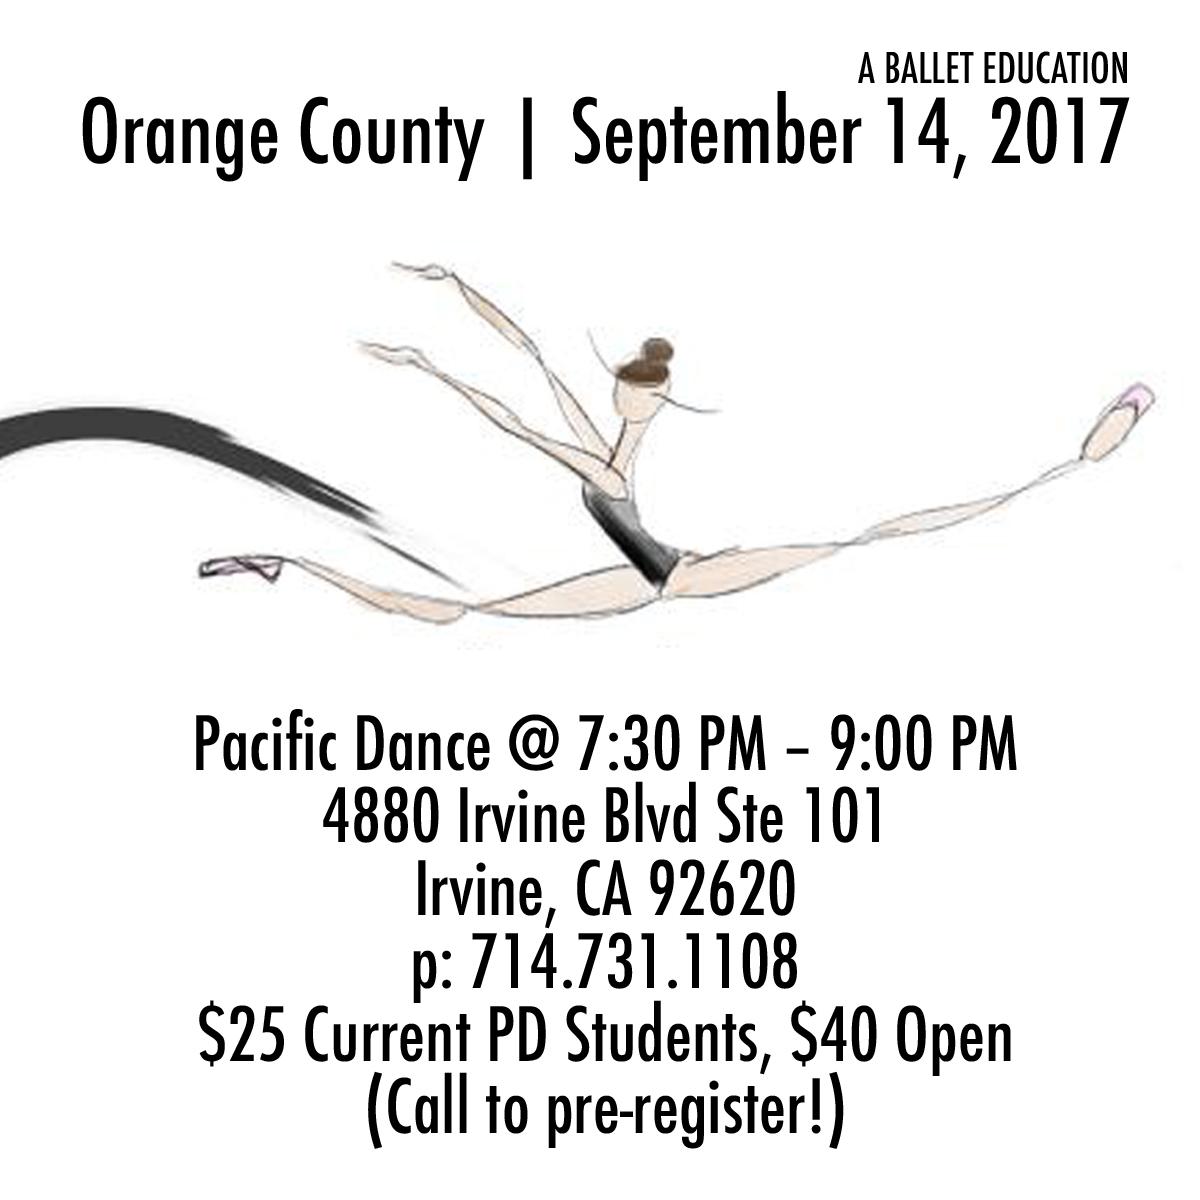 a ballet education orange county